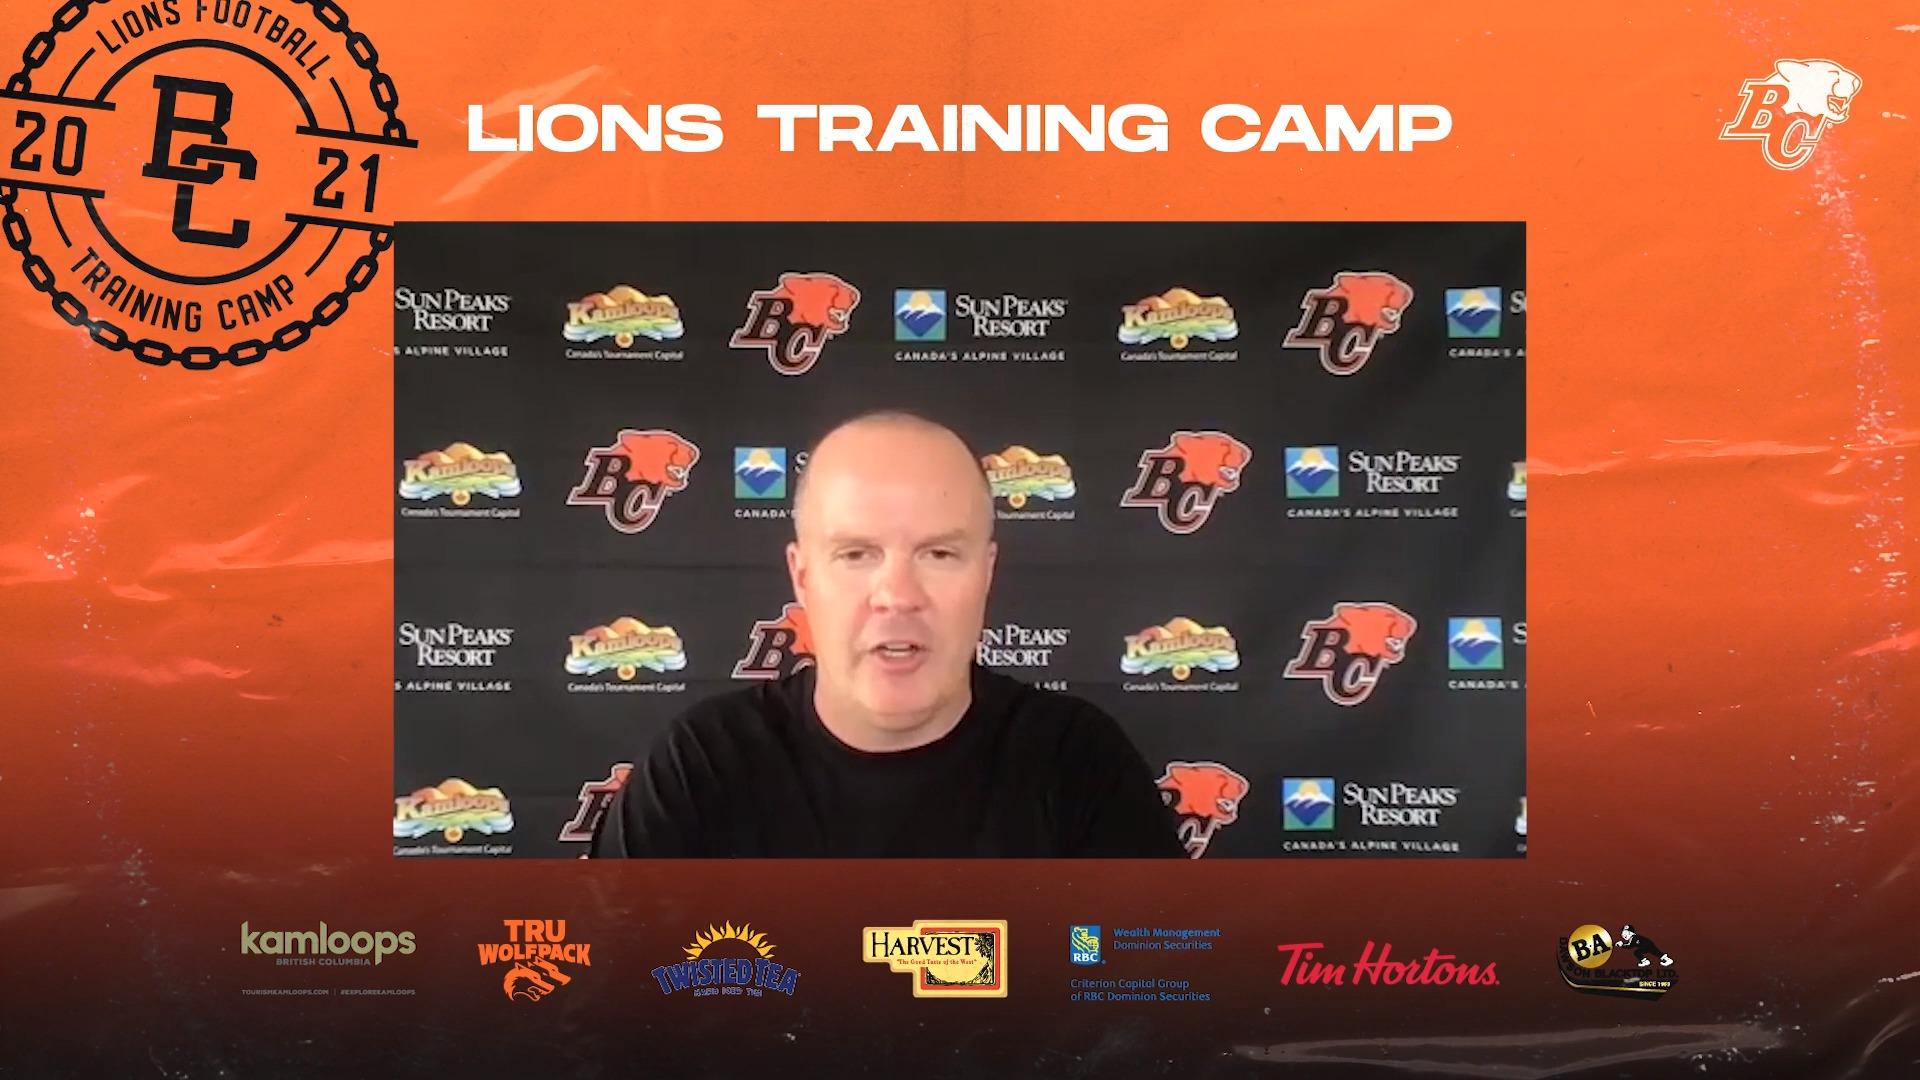 Training Camp July 13 | Rick Campbell